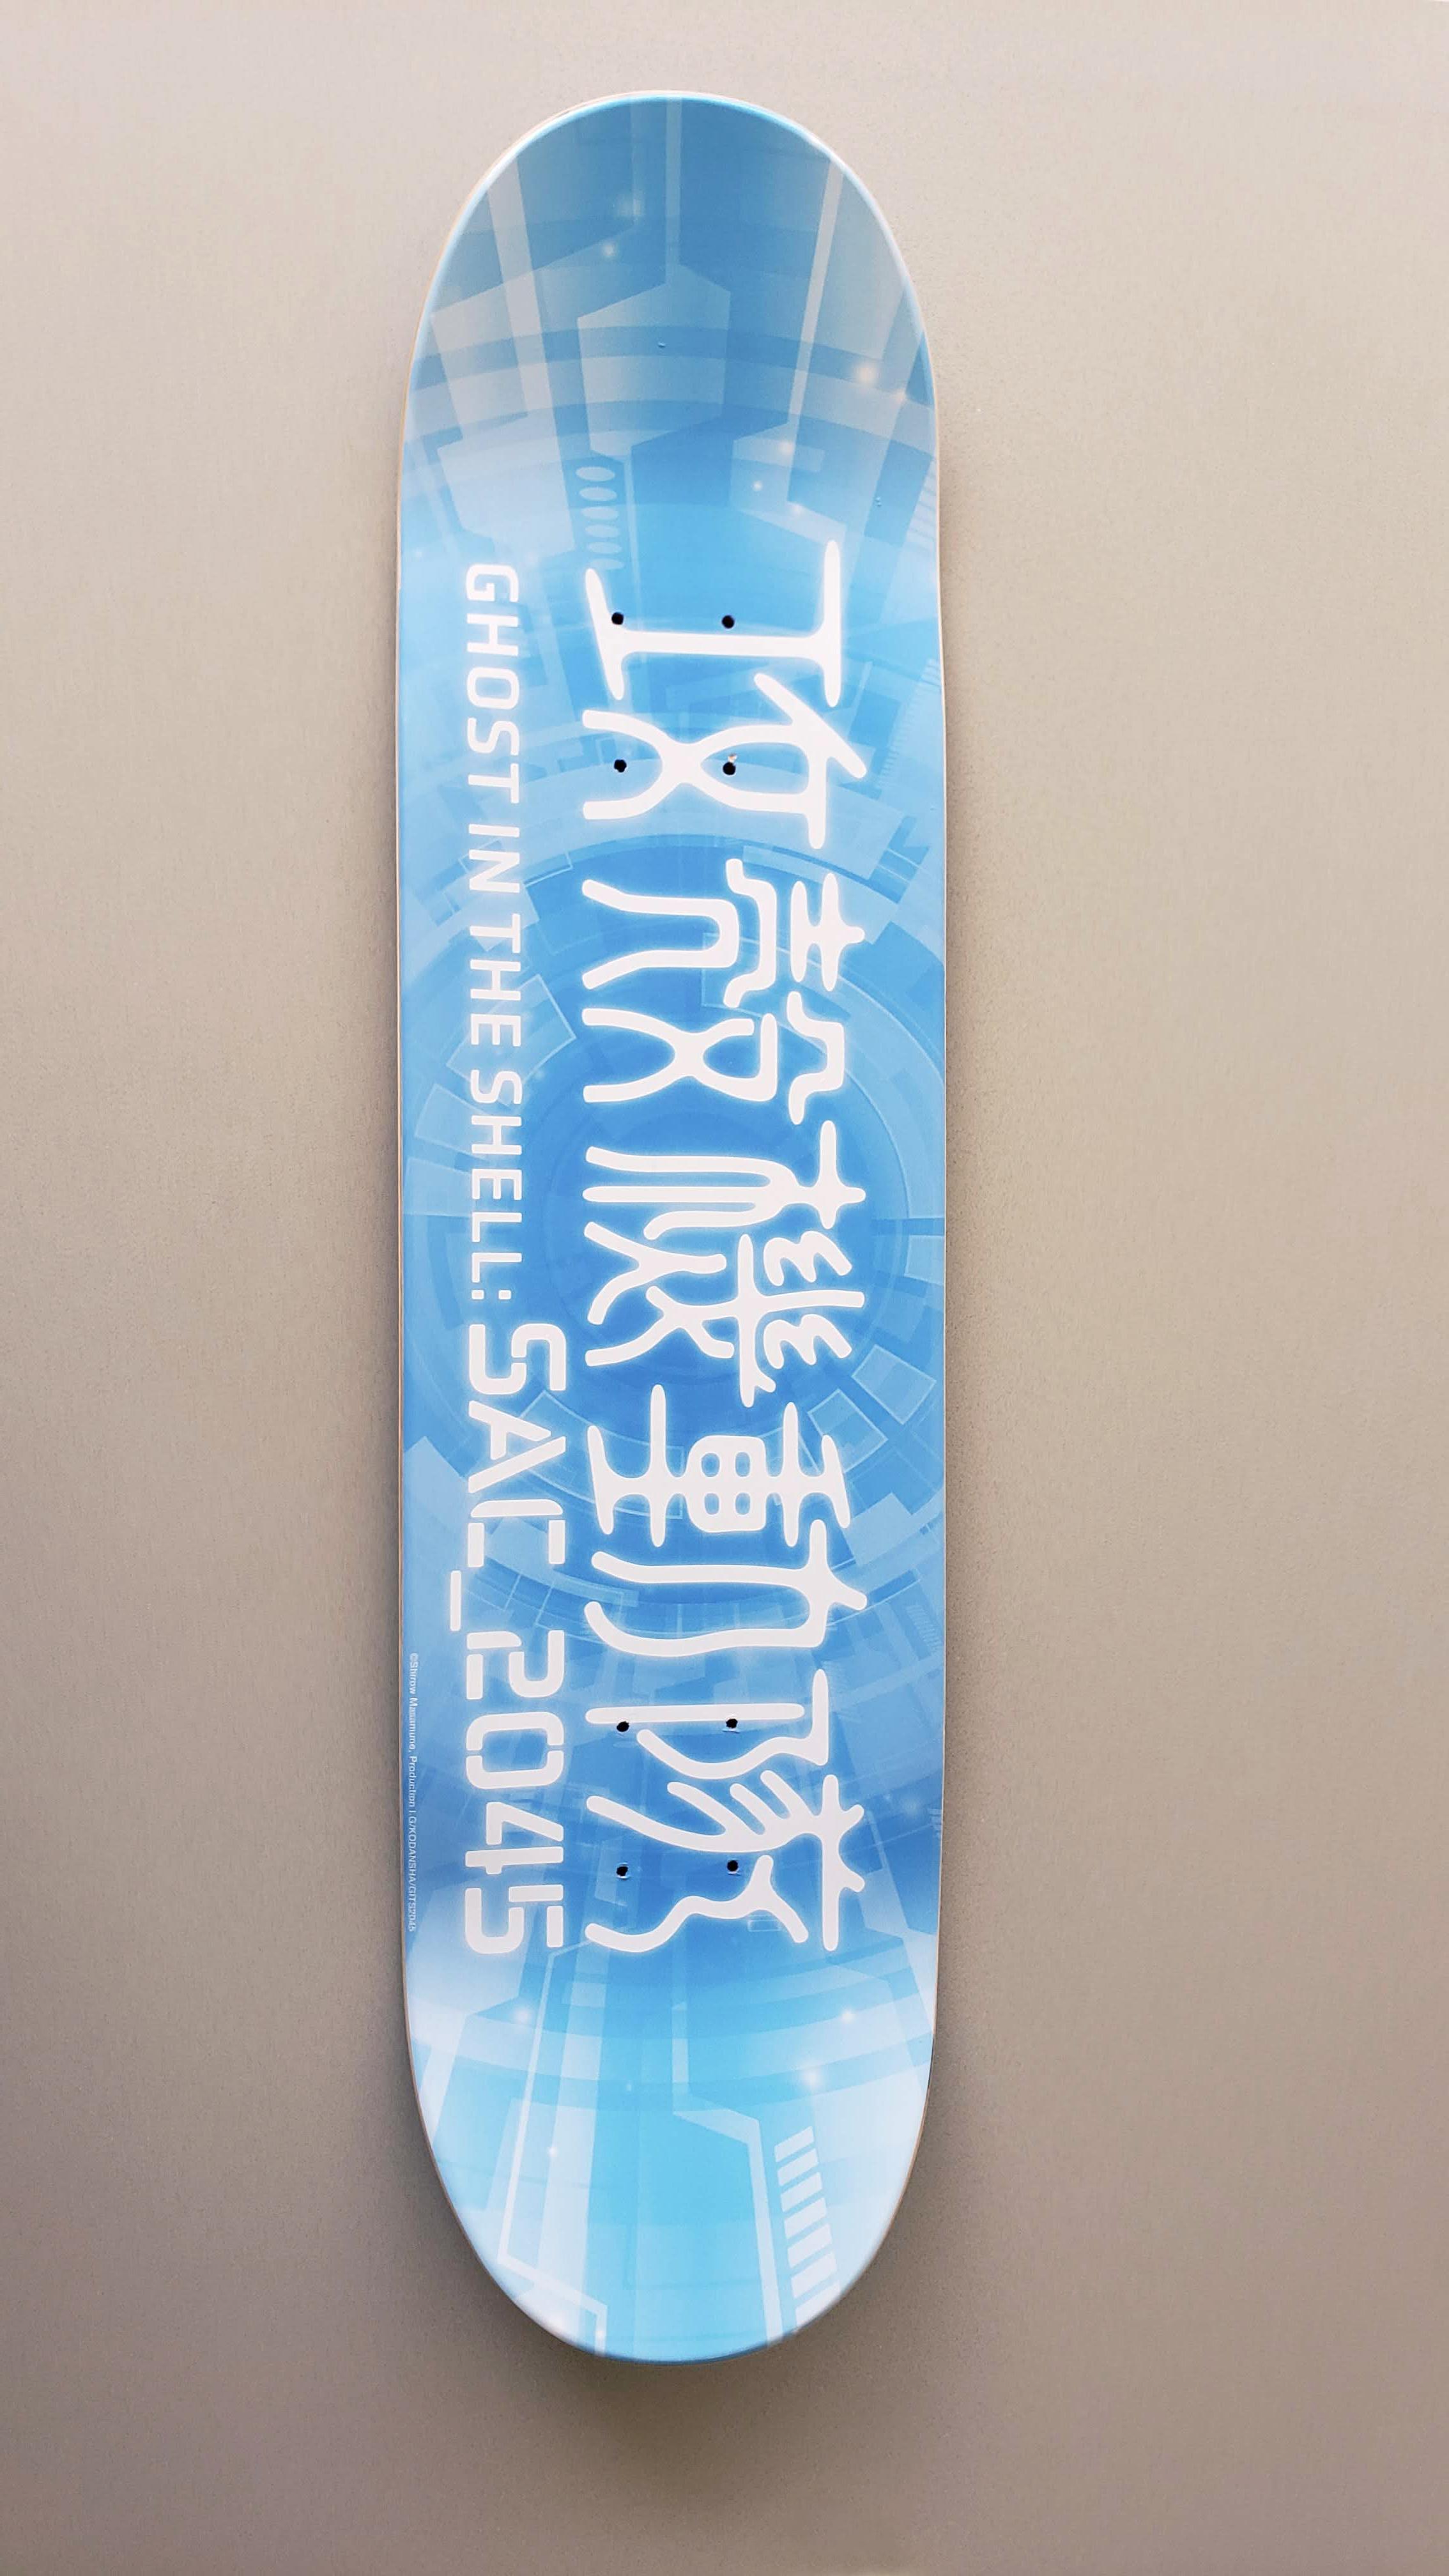 GHOST IN THE SHELL: SAC_2045 Motoko Kusanagi Skateboard Deck [December 2021 Delivery]